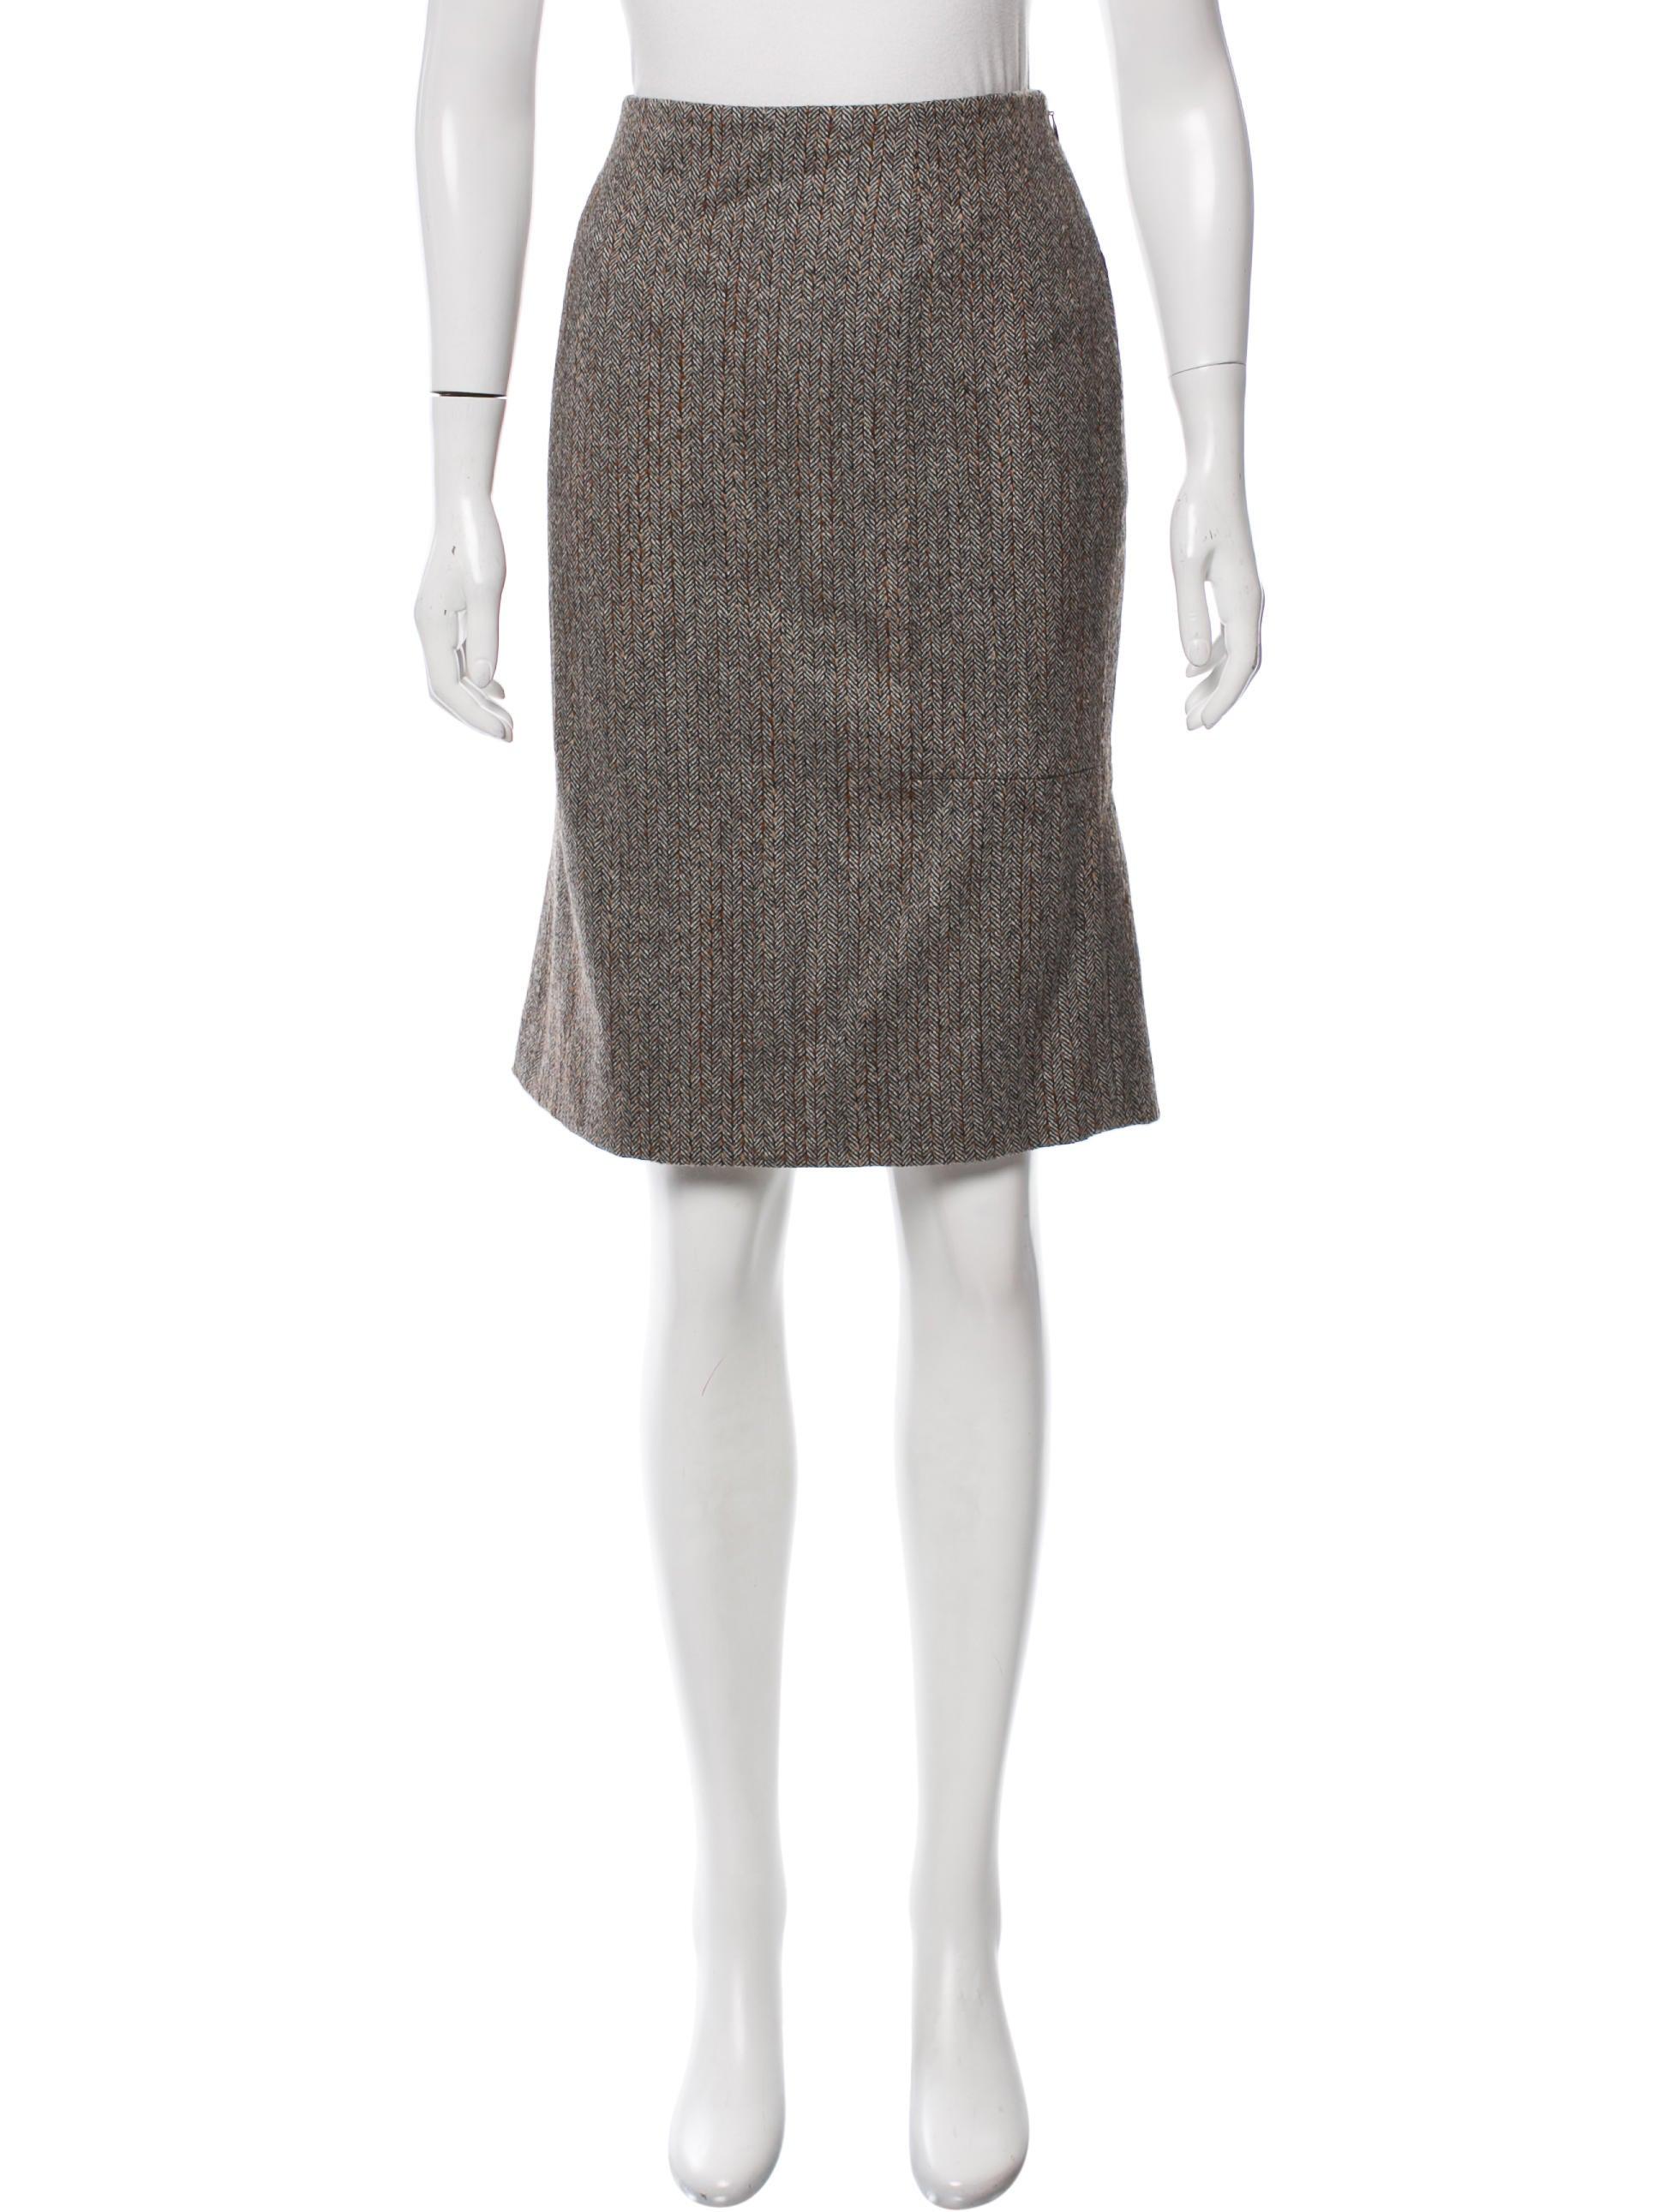 carolina herrera herringbone patterned pencil skirt